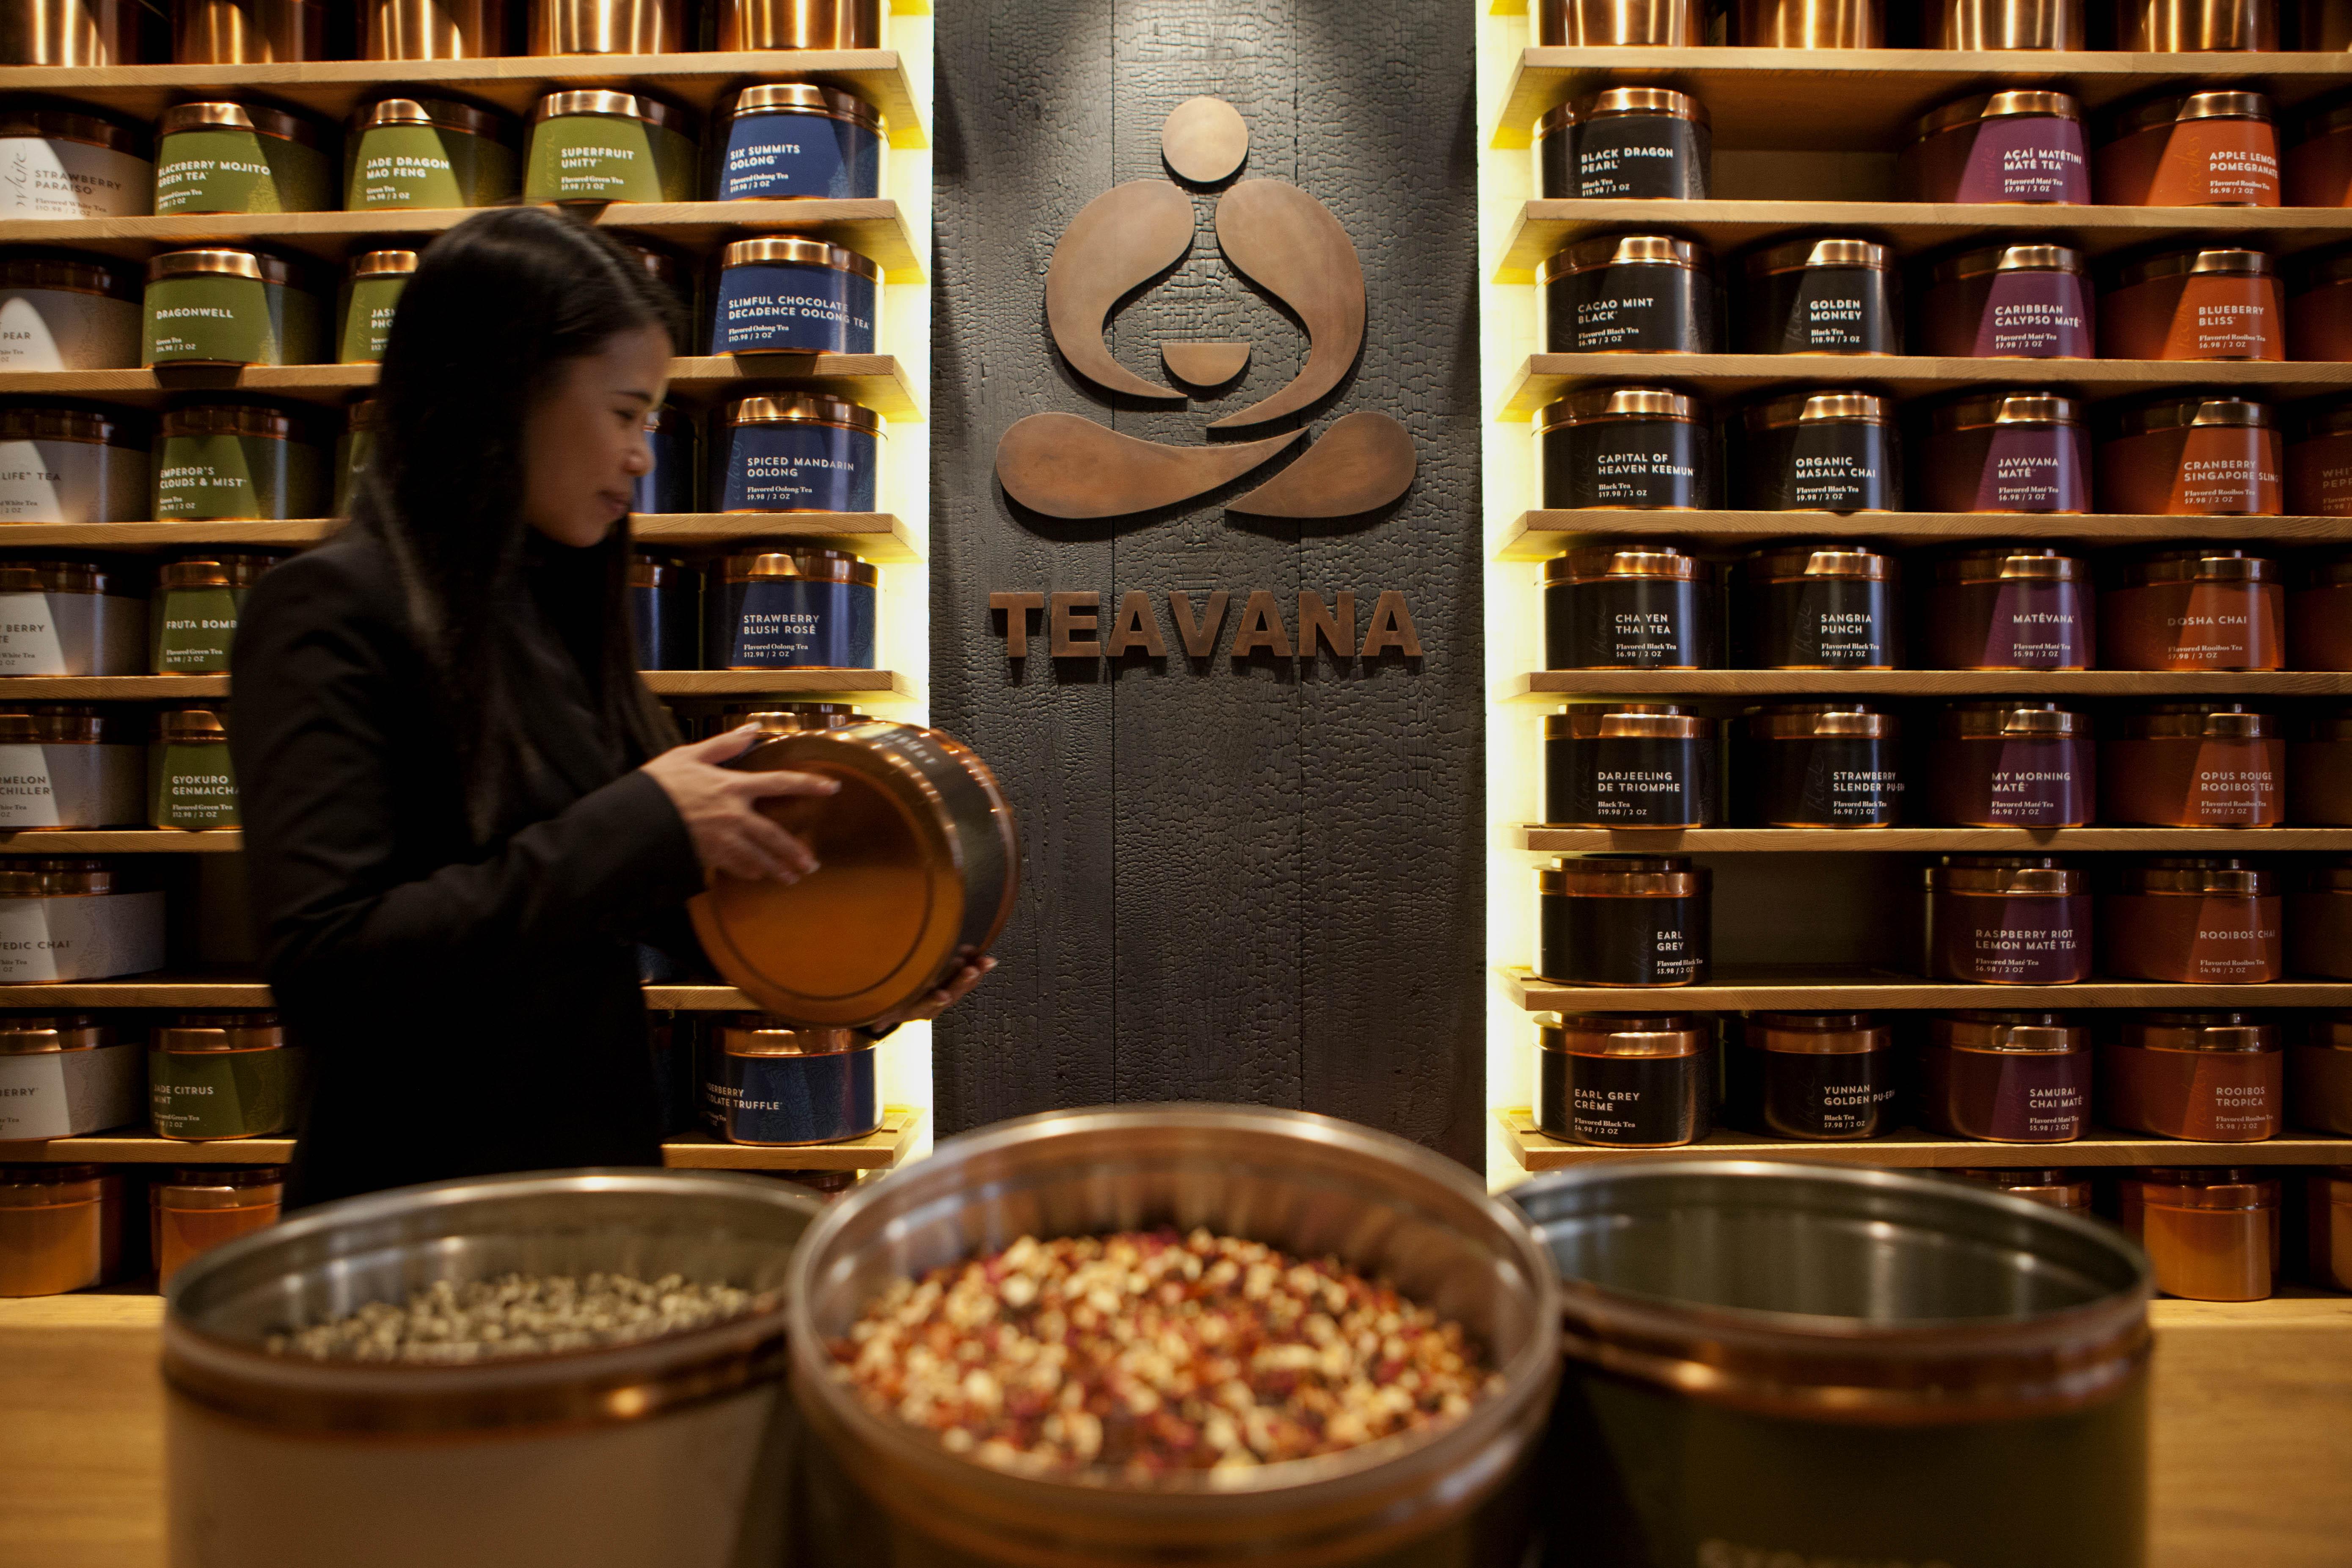 Tins of tea sit stacked at a Teavana tea bar in New York, U.S., on Oct. 24, 2013.